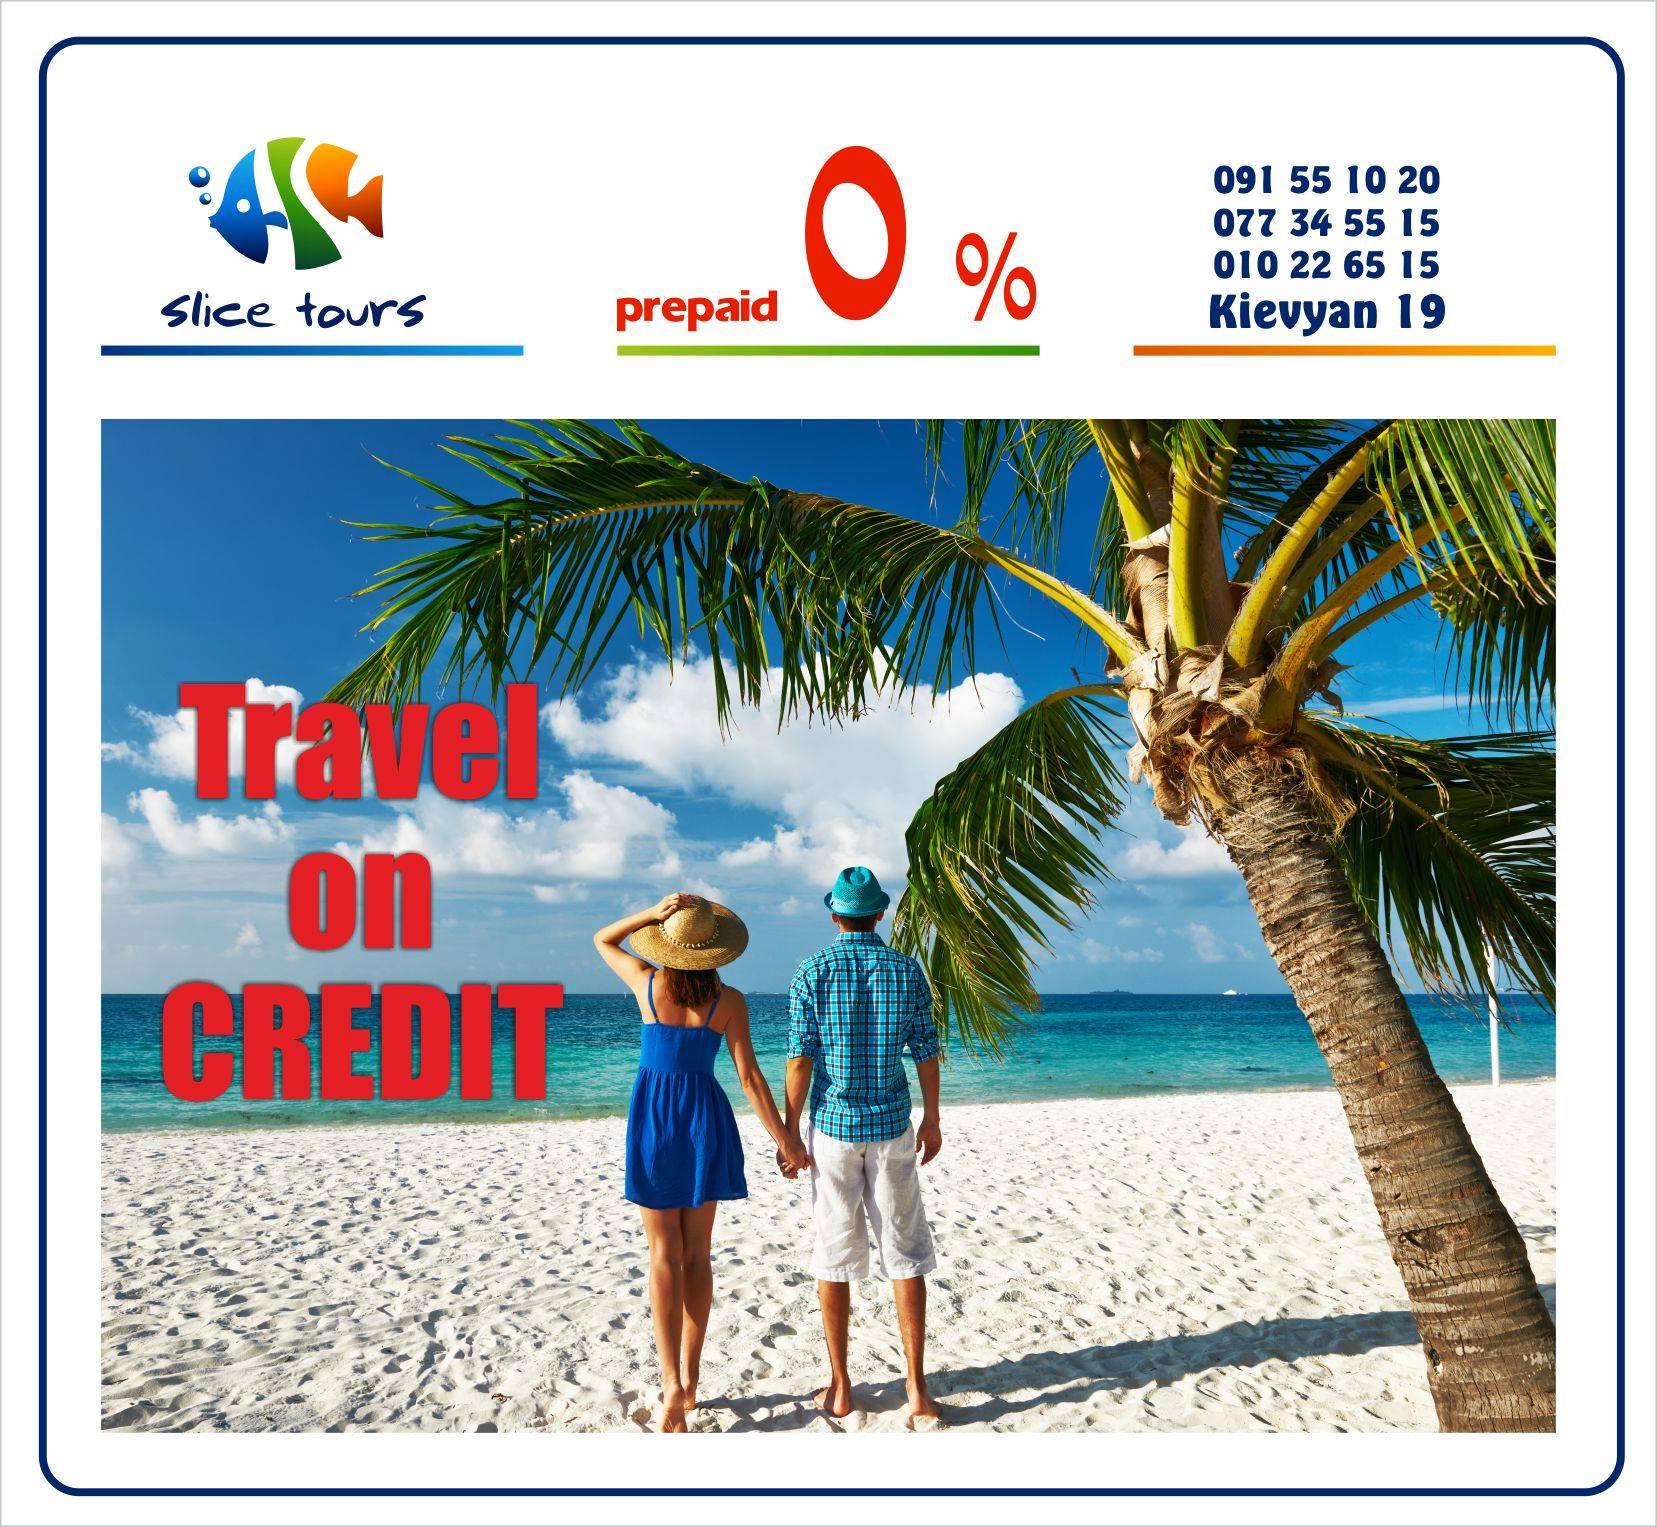 Travel on credit